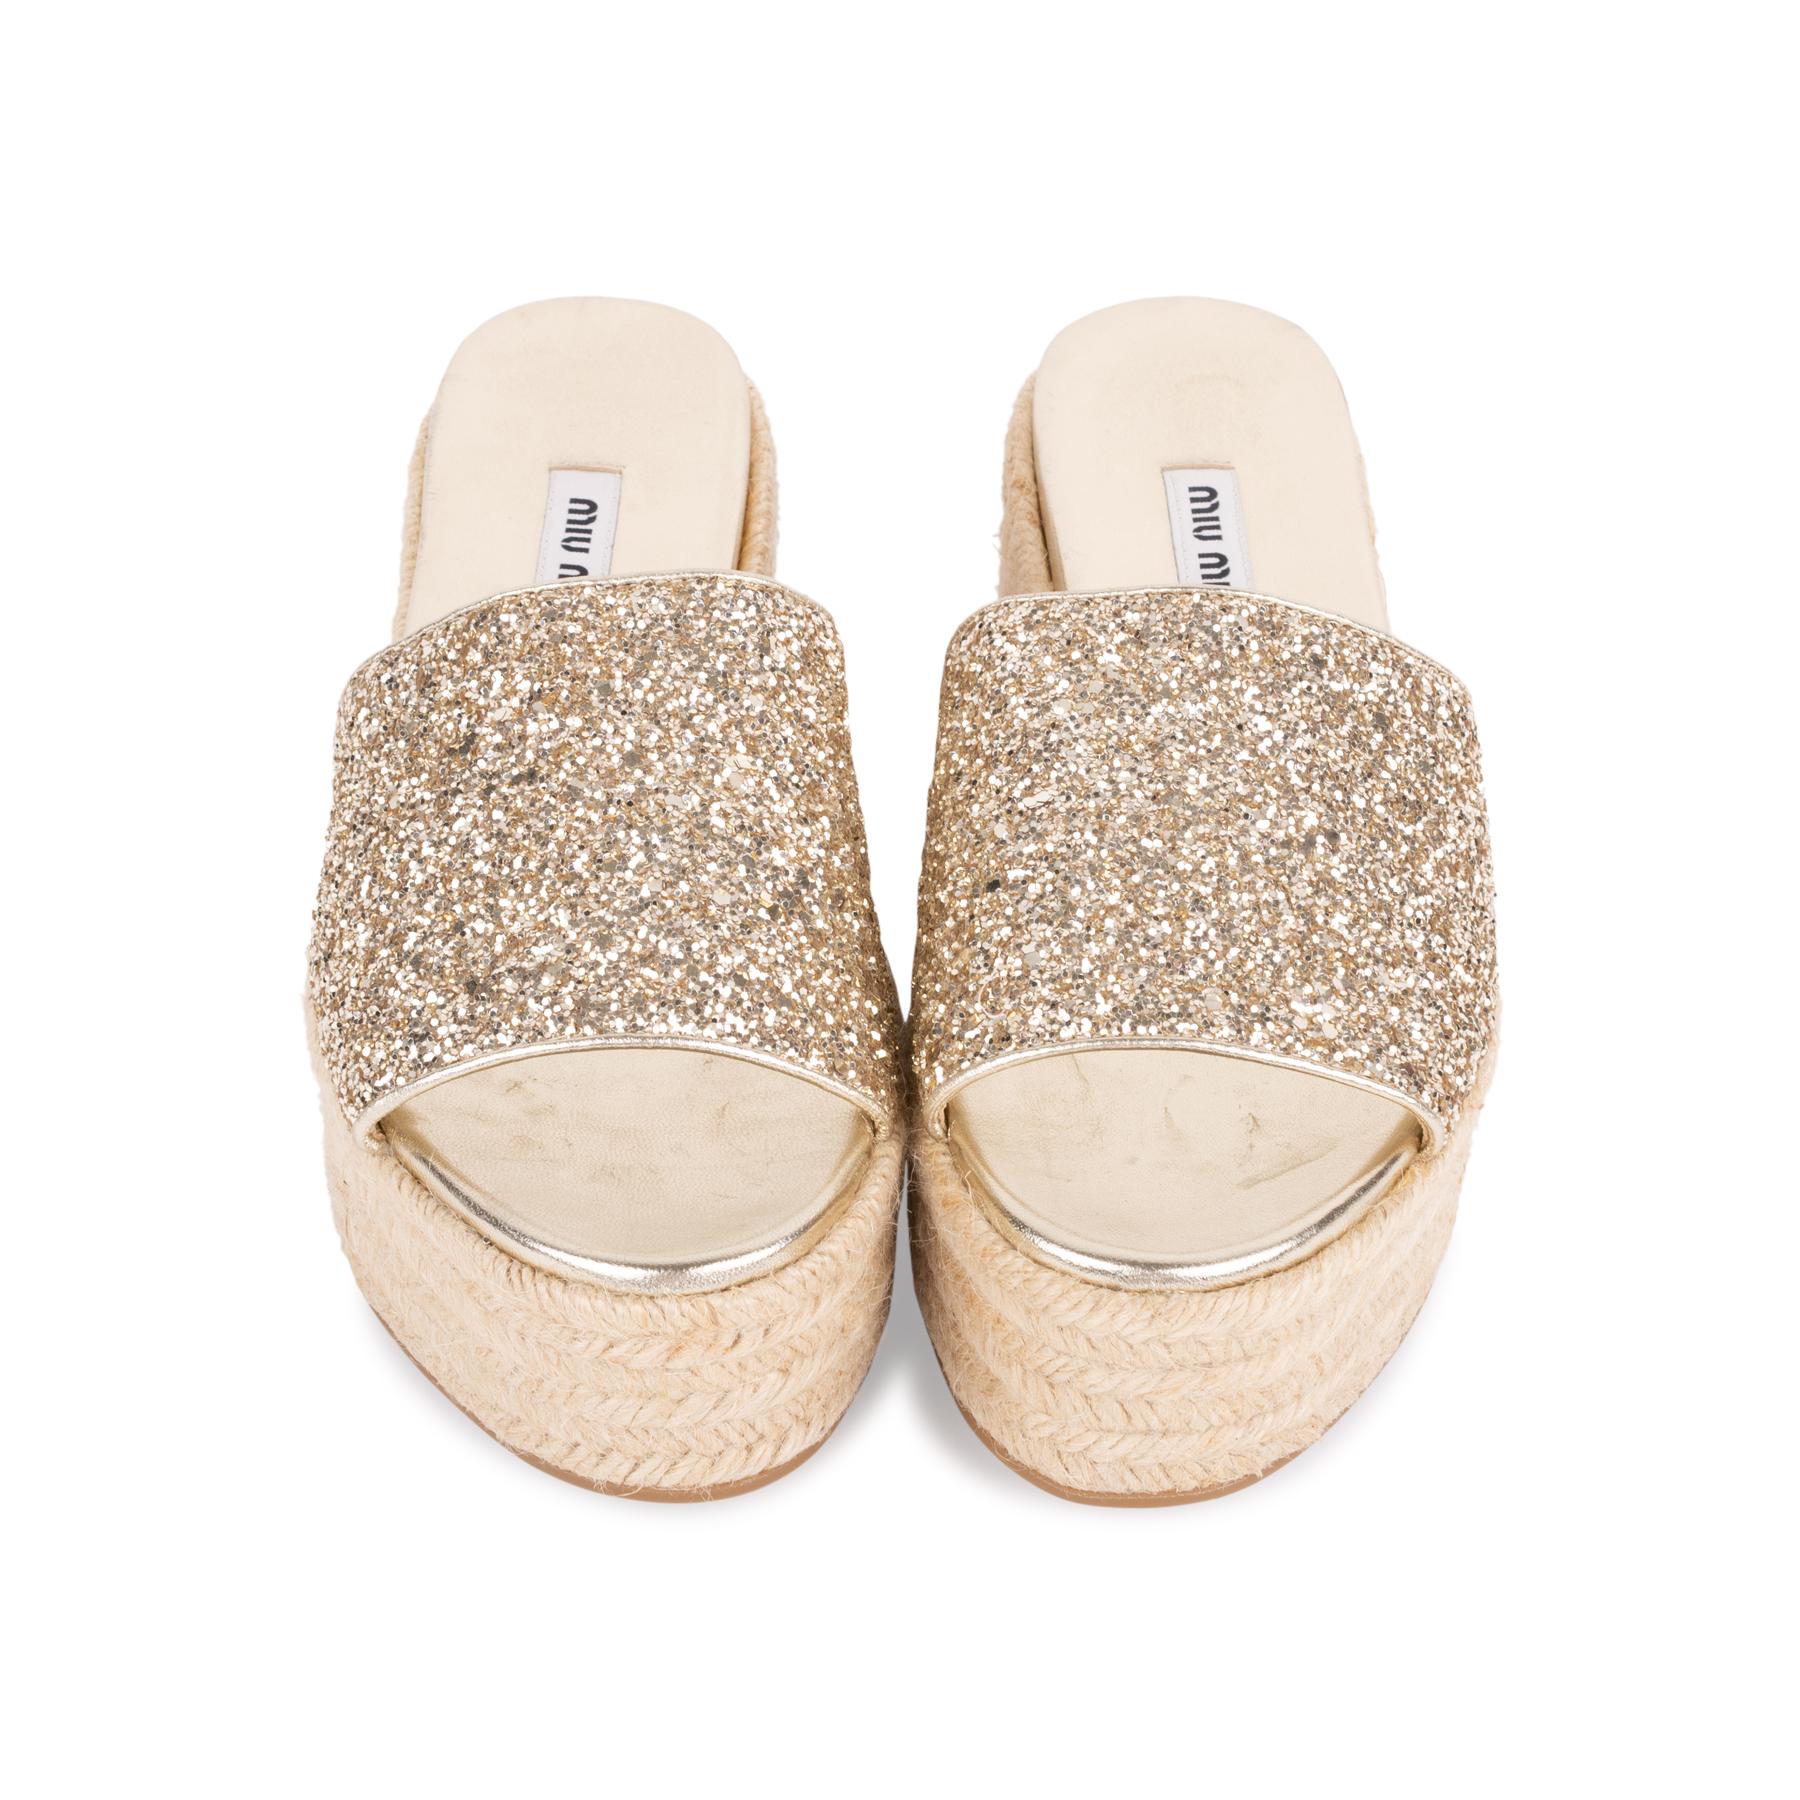 5286bed2264 Authentic Second Hand Miu Miu Glitter Platform Espadrille Sandals  (PSS-049-00078)